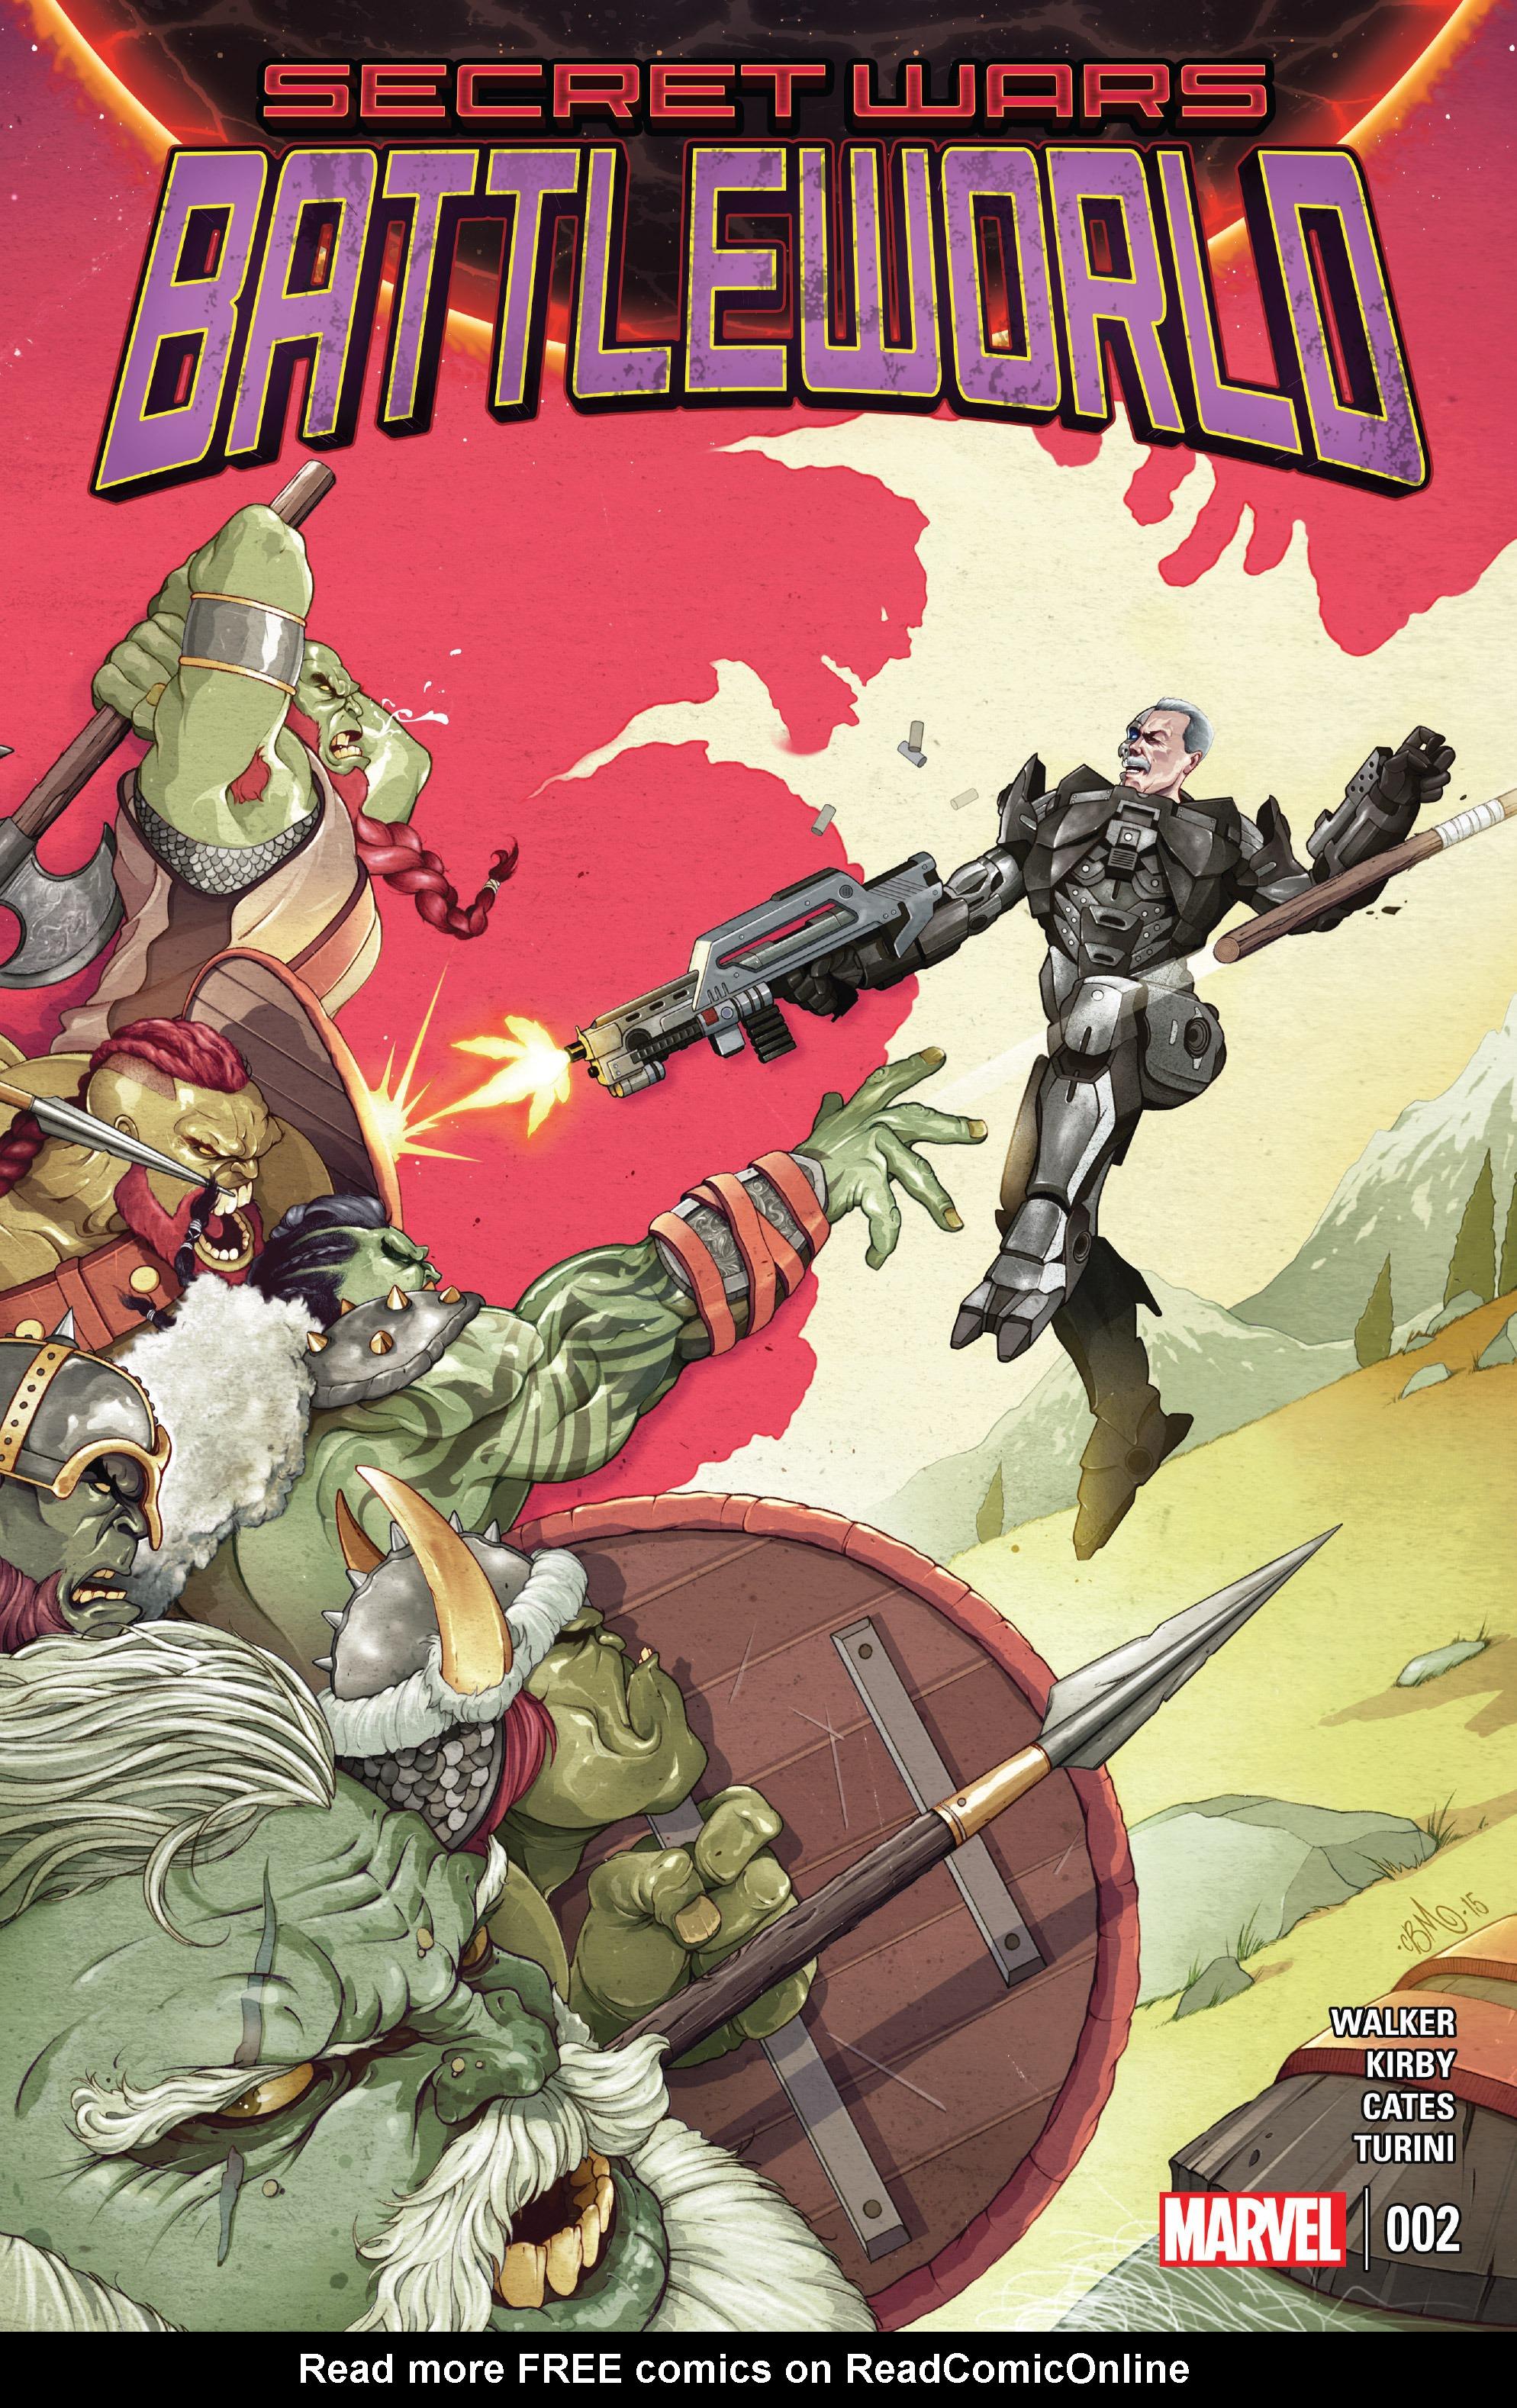 Read online Secret Wars: Battleworld comic -  Issue #2 - 1